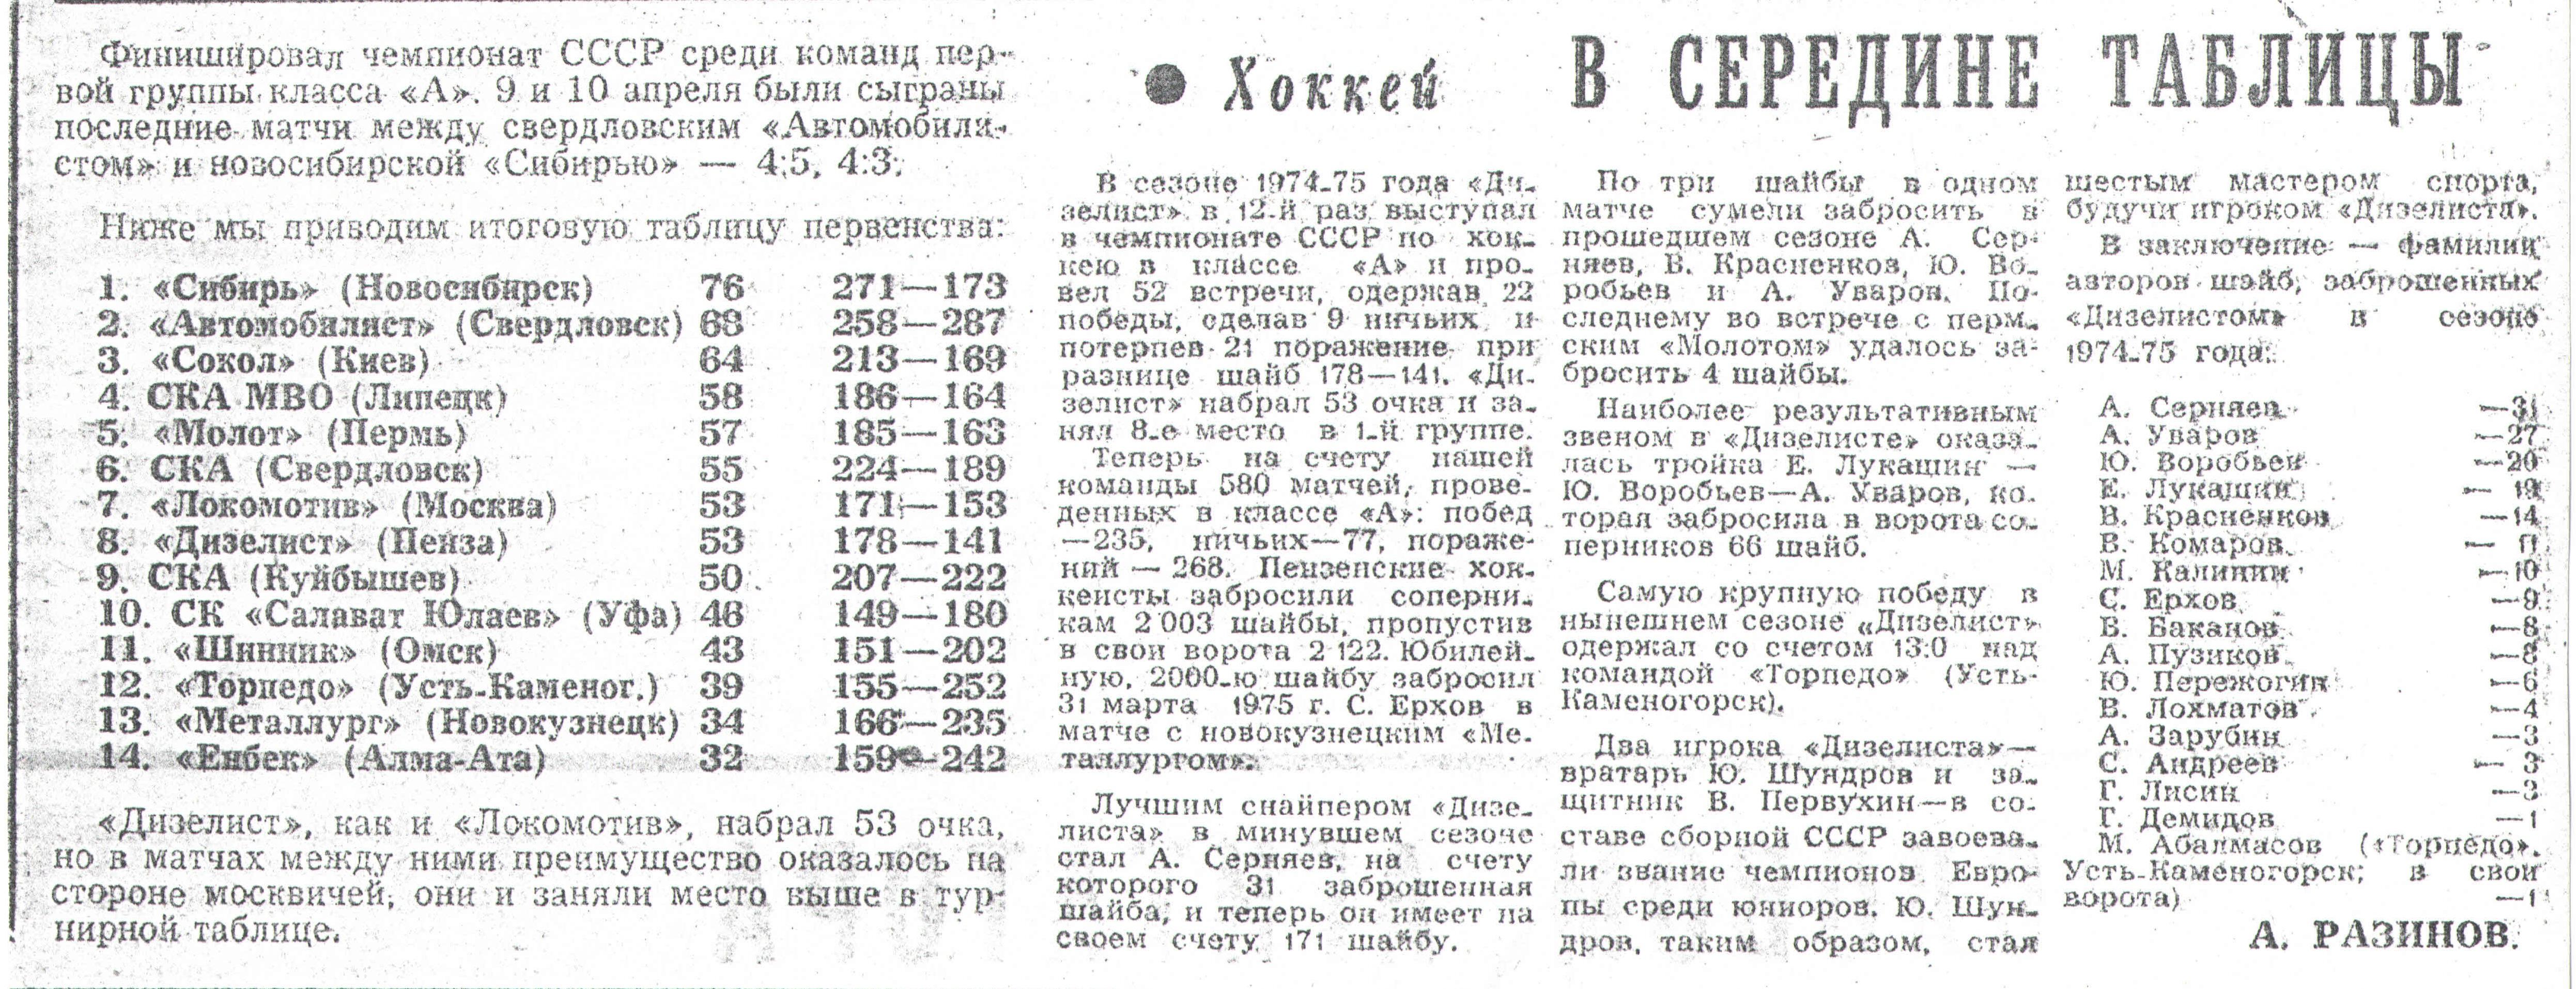 1974-75 итоги.jpg